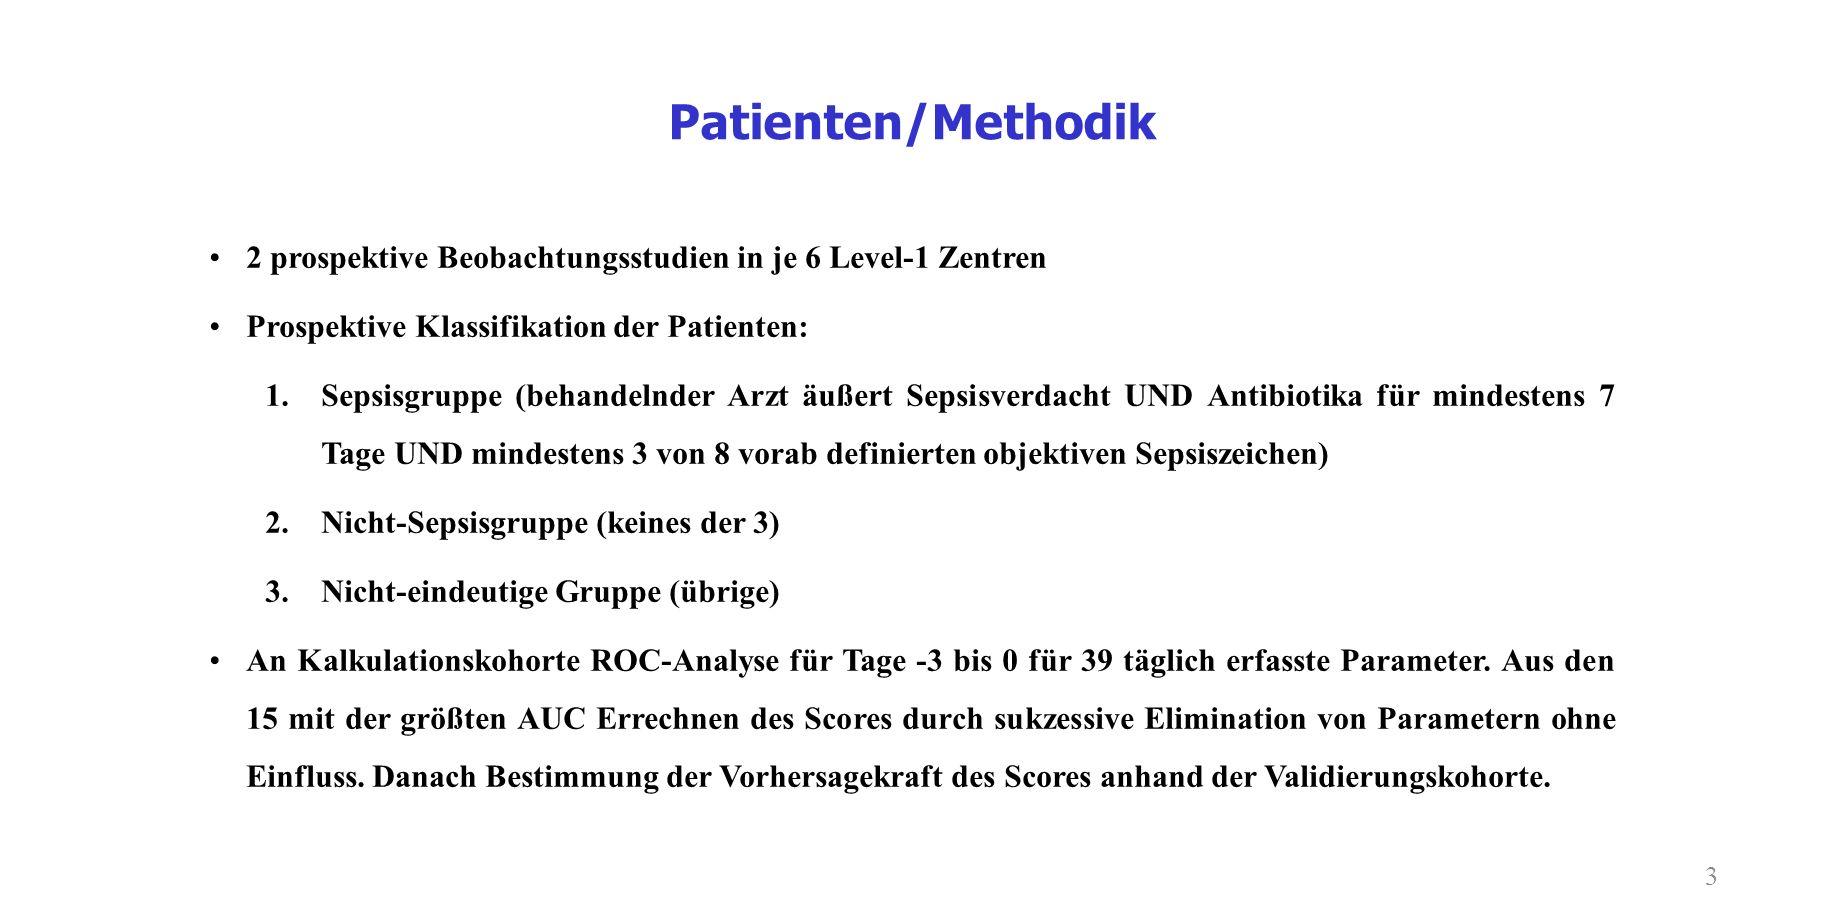 3 2 prospektive Beobachtungsstudien in je 6 Level-1 Zentren Prospektive Klassifikation der Patienten: 1.Sepsisgruppe (behandelnder Arzt äußert Sepsisv